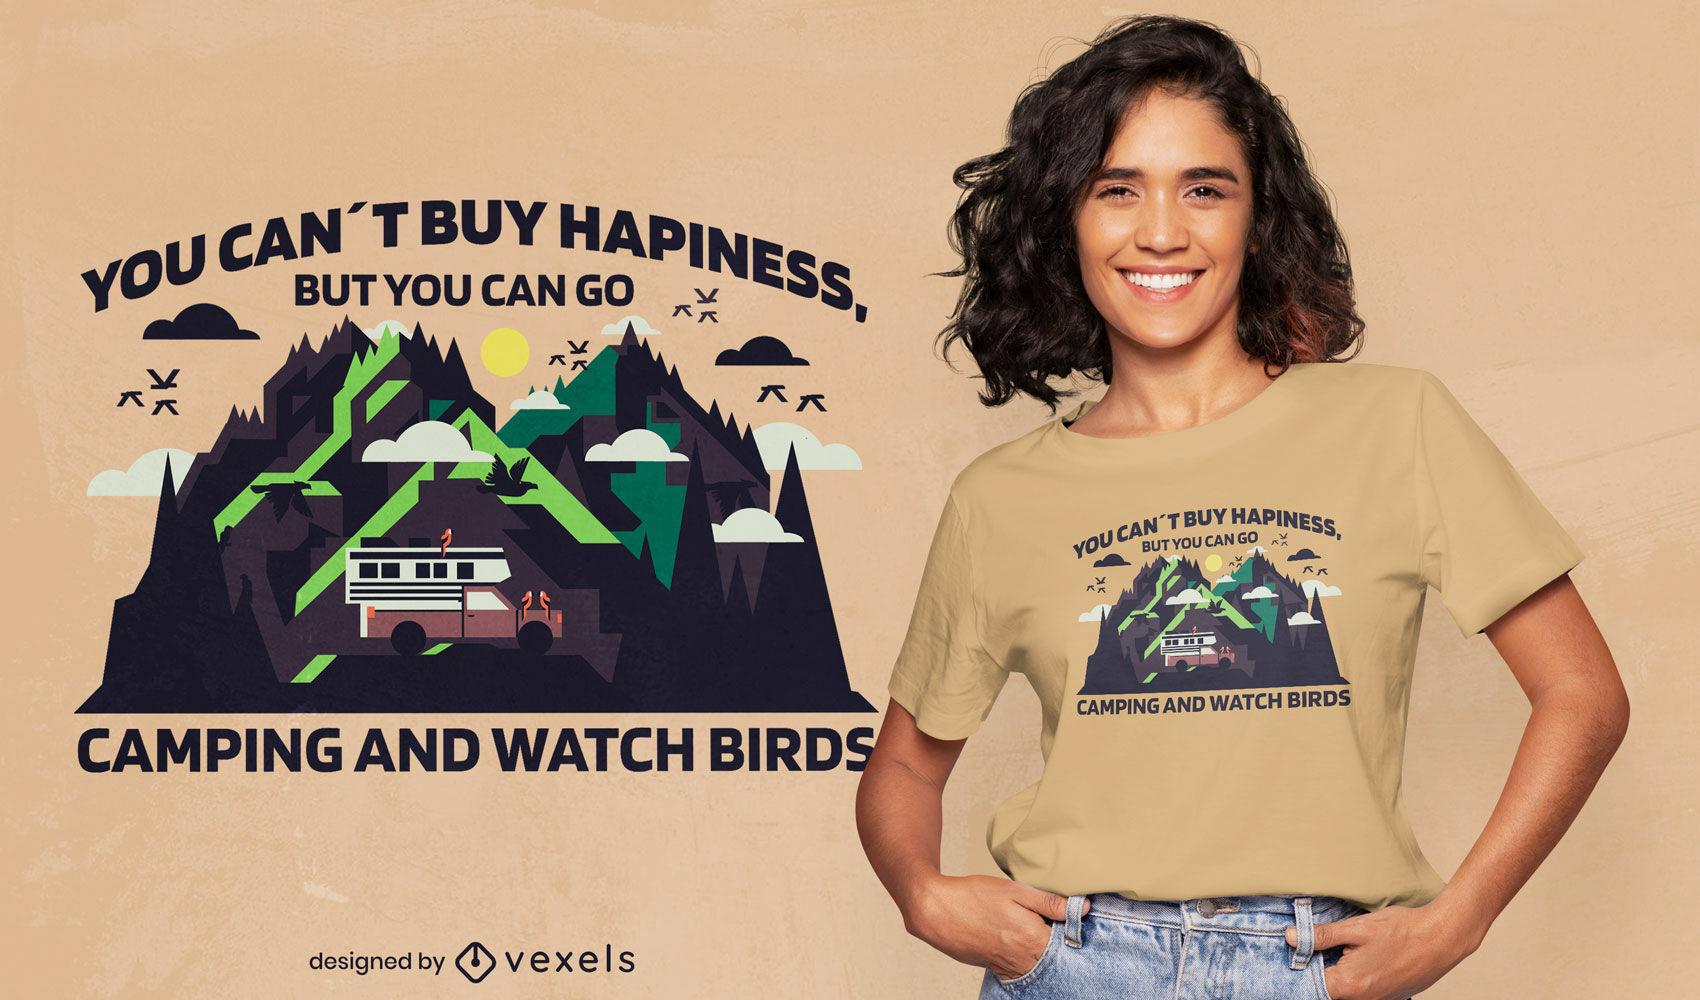 Bird watching and camping t-shirt design